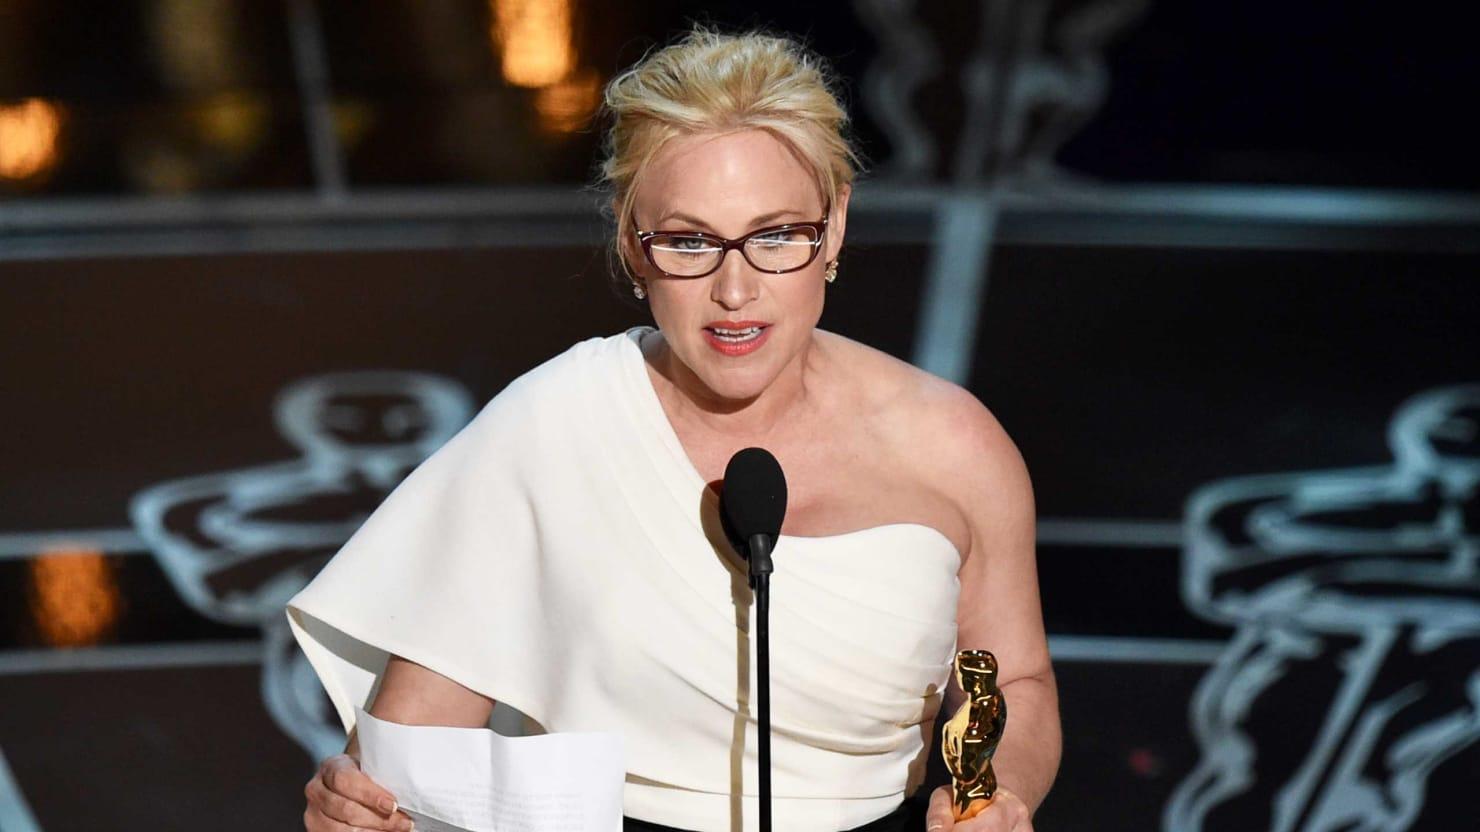 Patricia Arquette's Badass Oscar Acceptance Speech Demanding Equality for Women